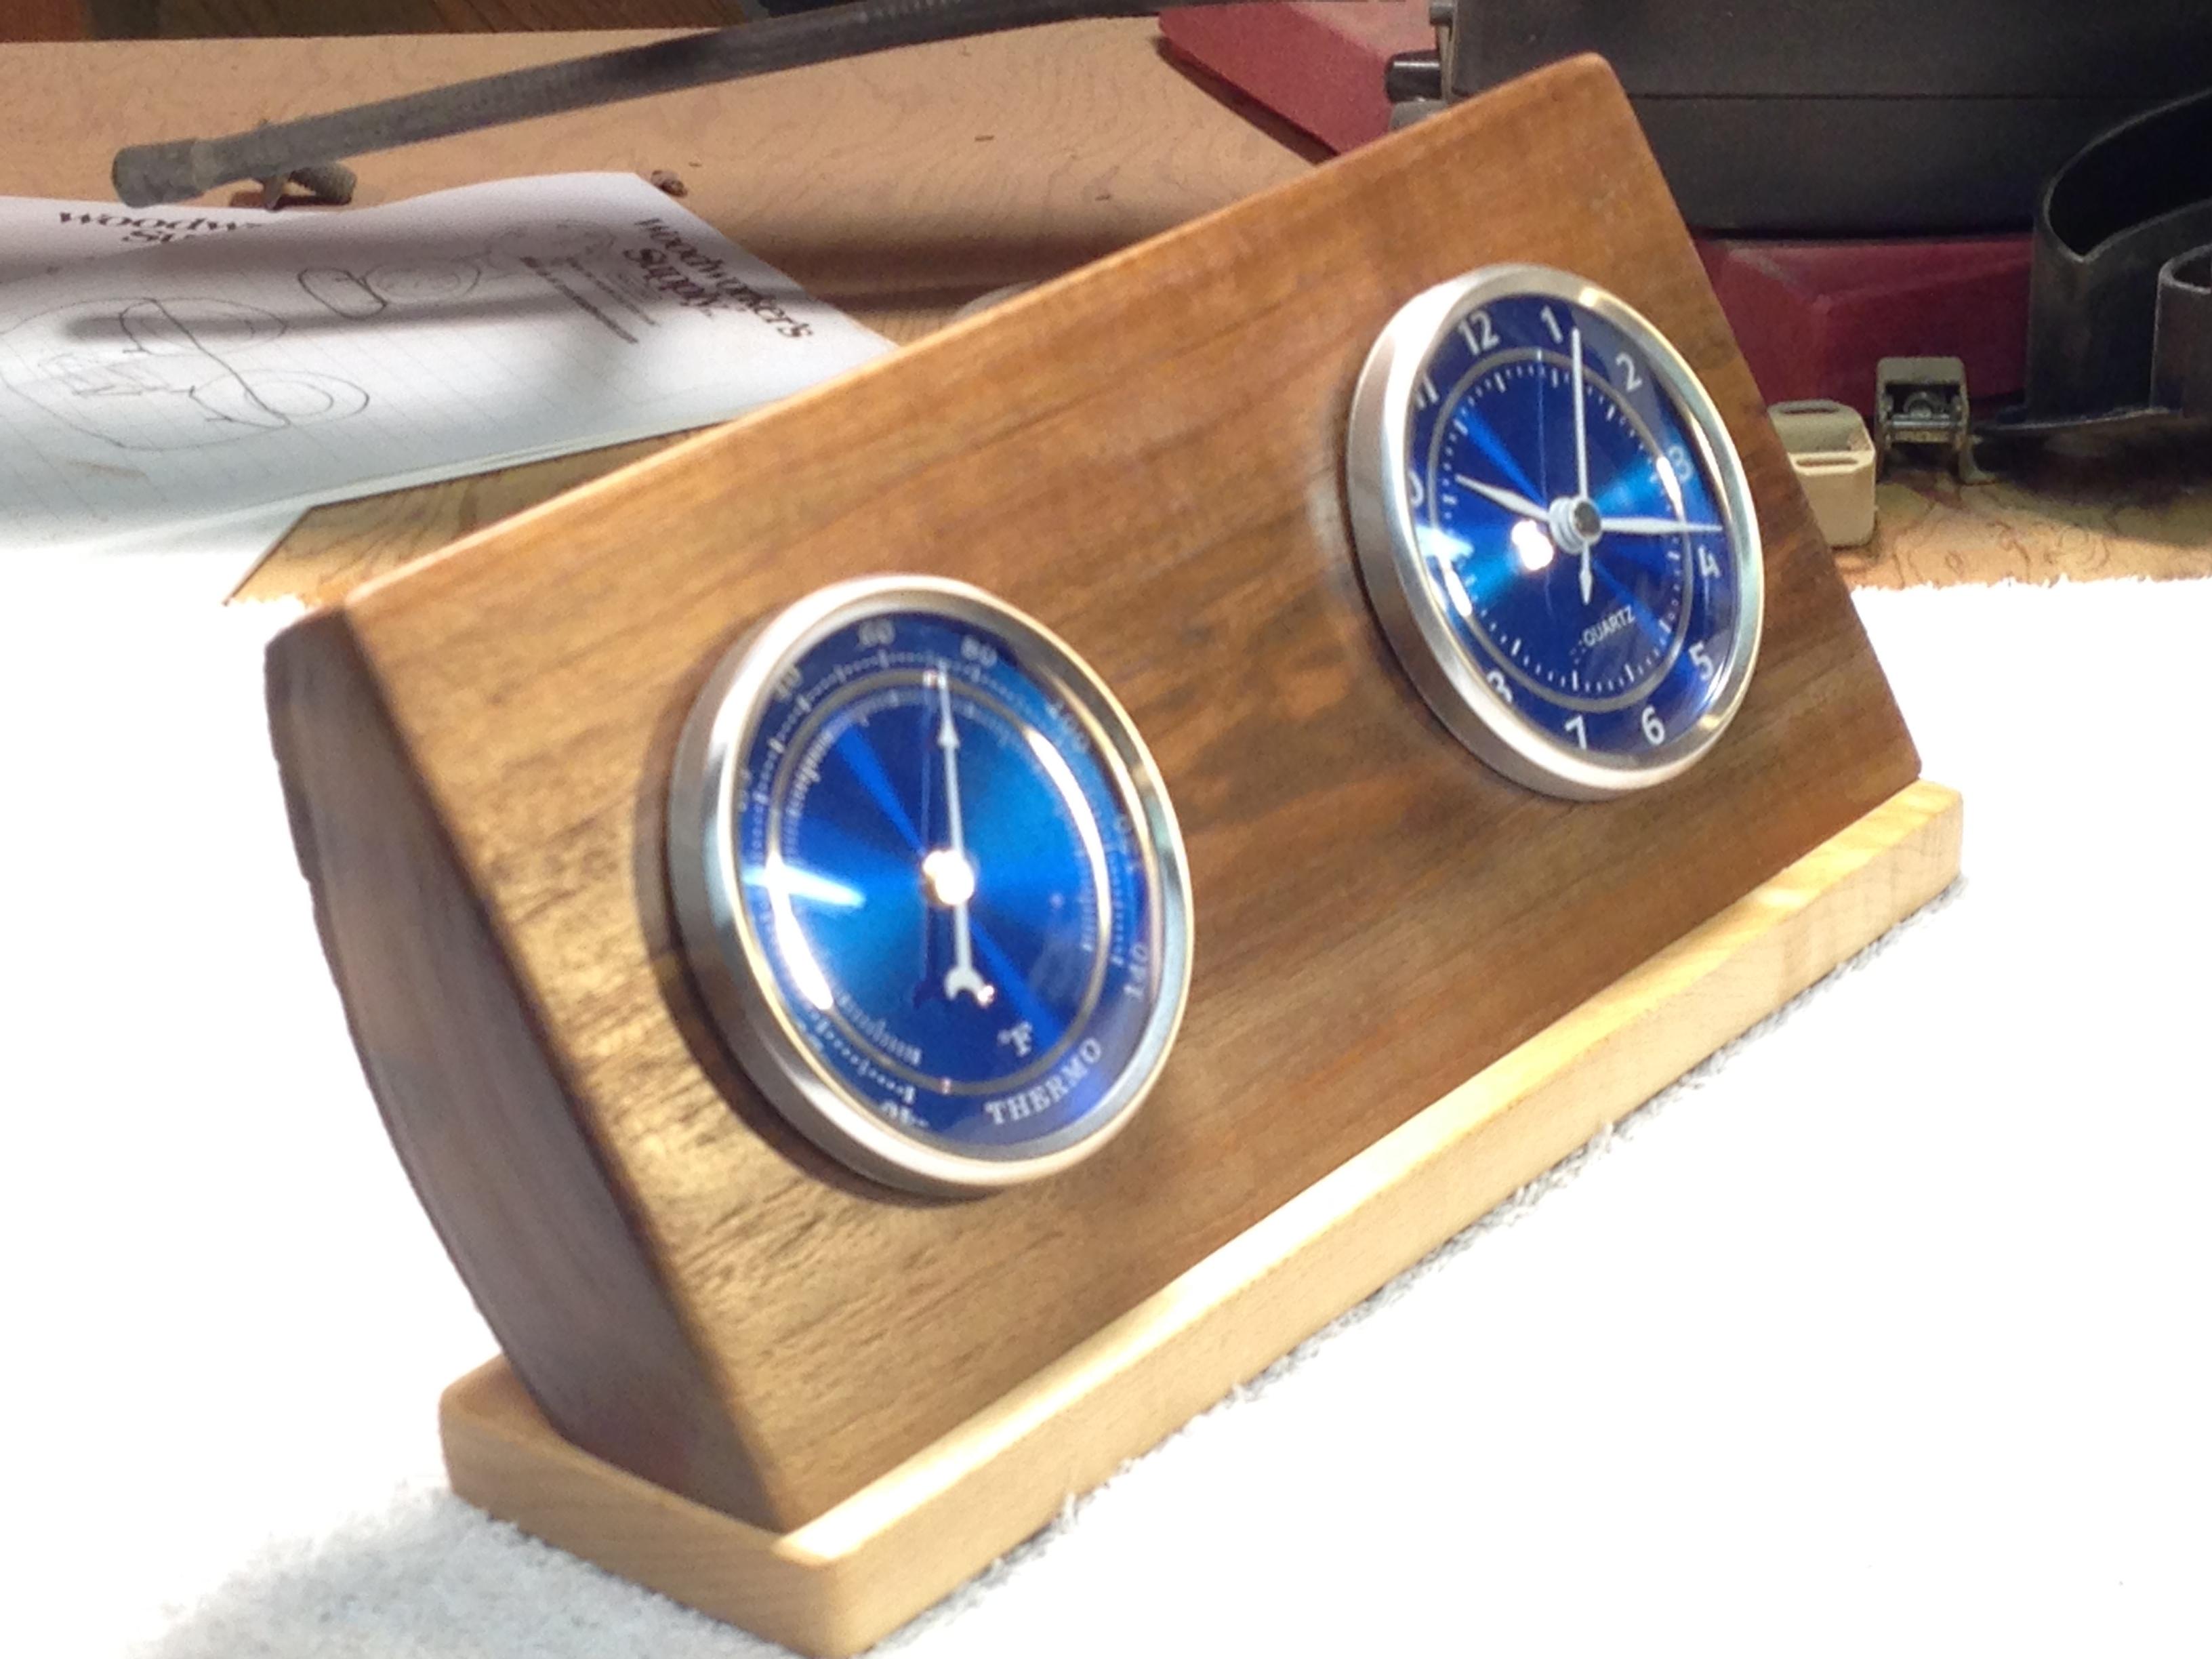 Desk Clock/Thermometer made from walnut, scrap, cutoff piece.